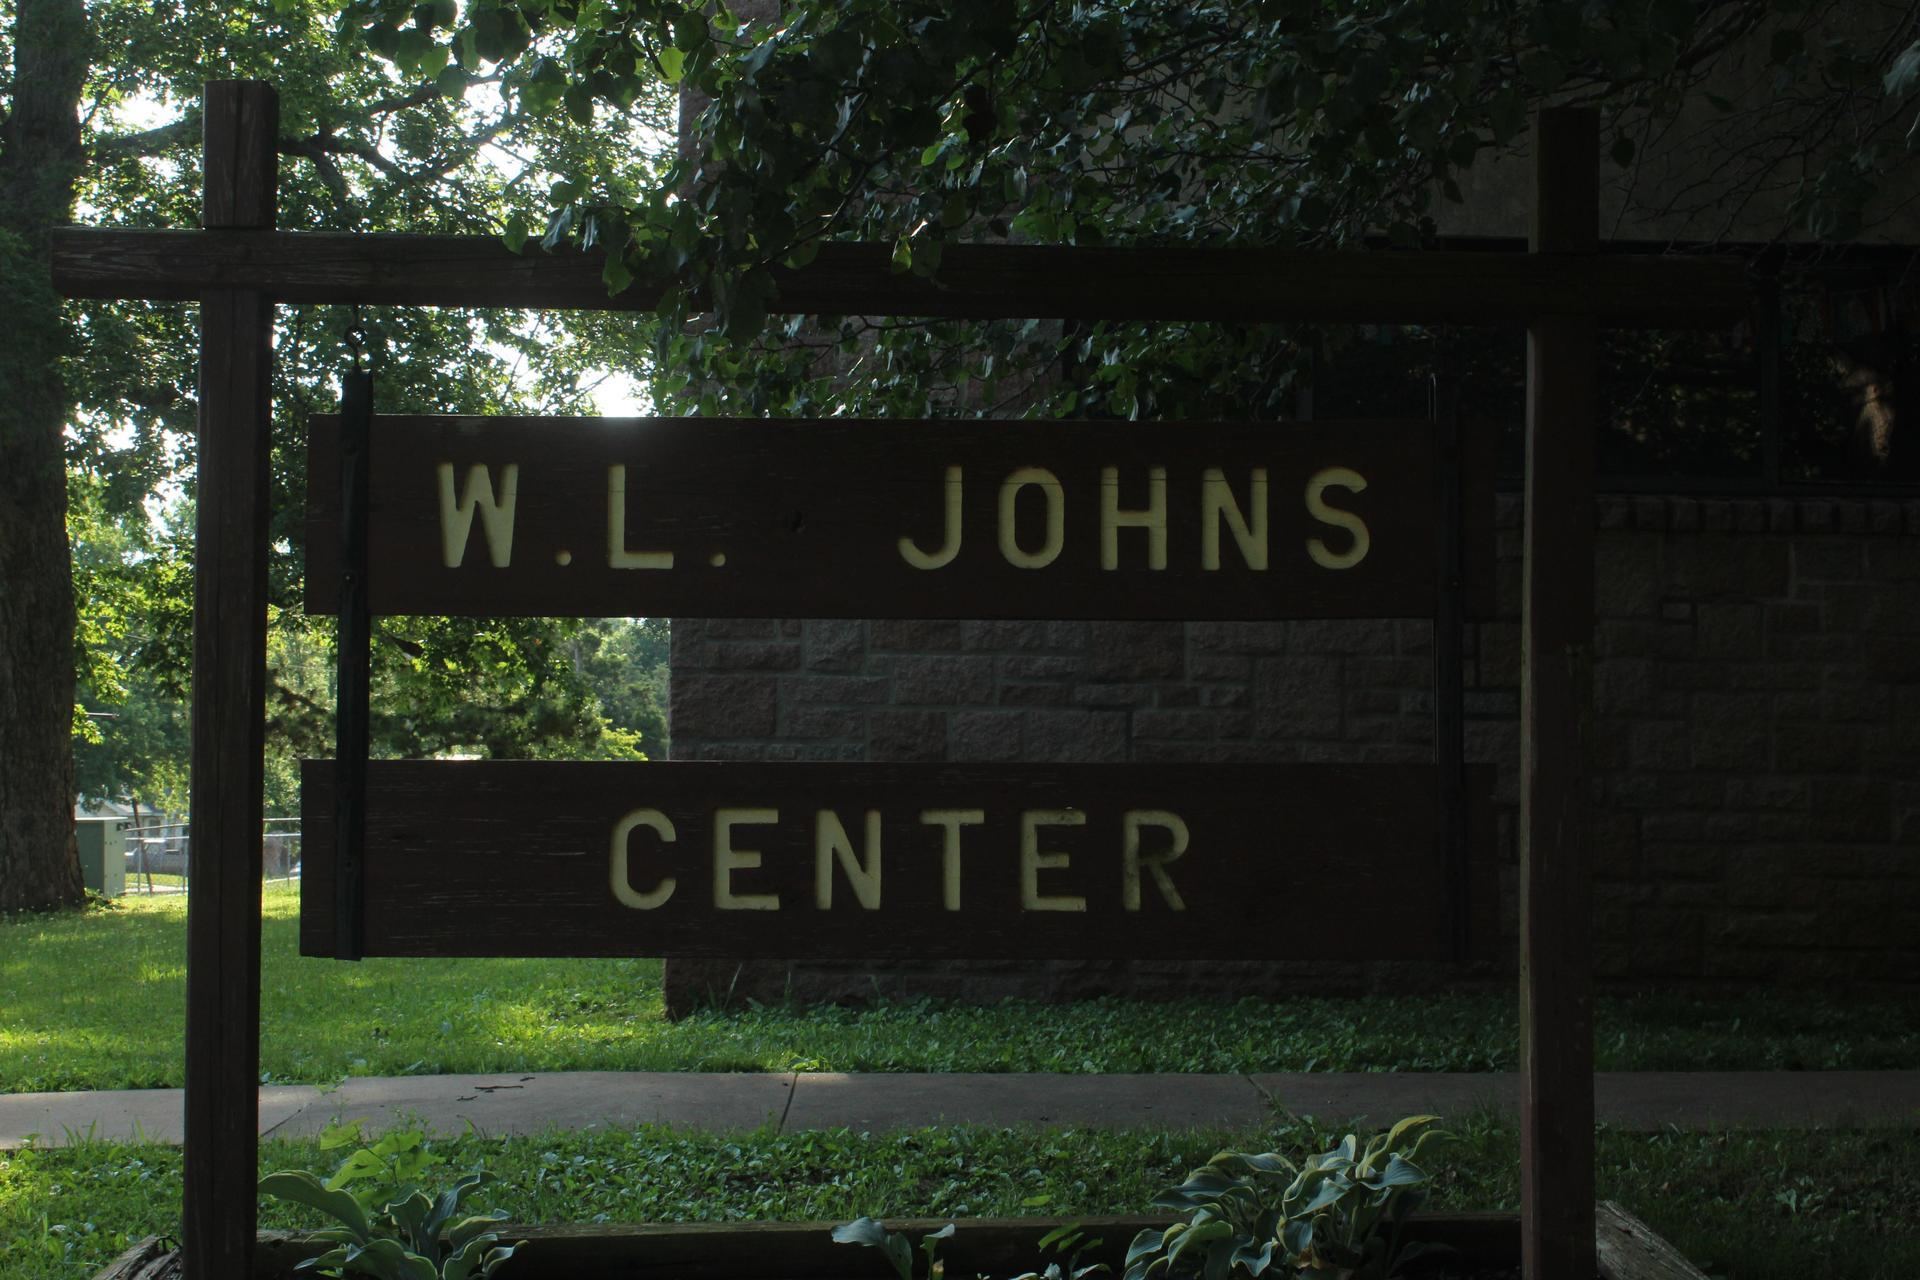 W.L. Johns Center